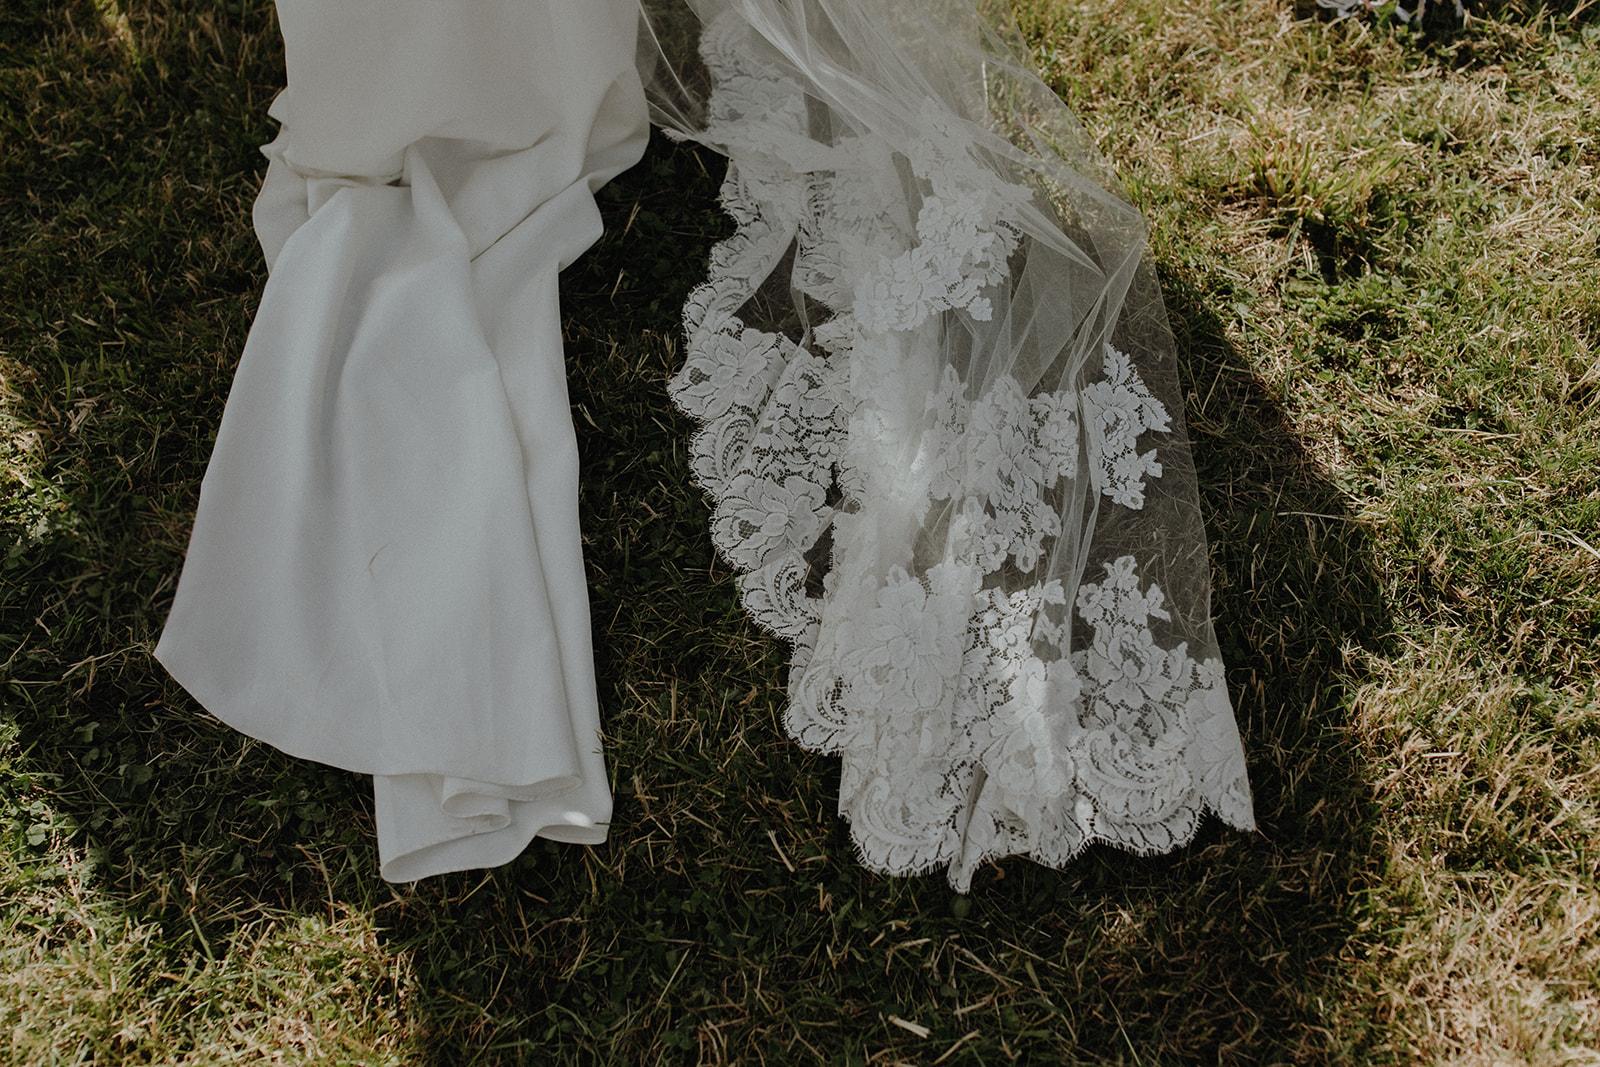 cortney_skye_wedding_june2019-515.jpg